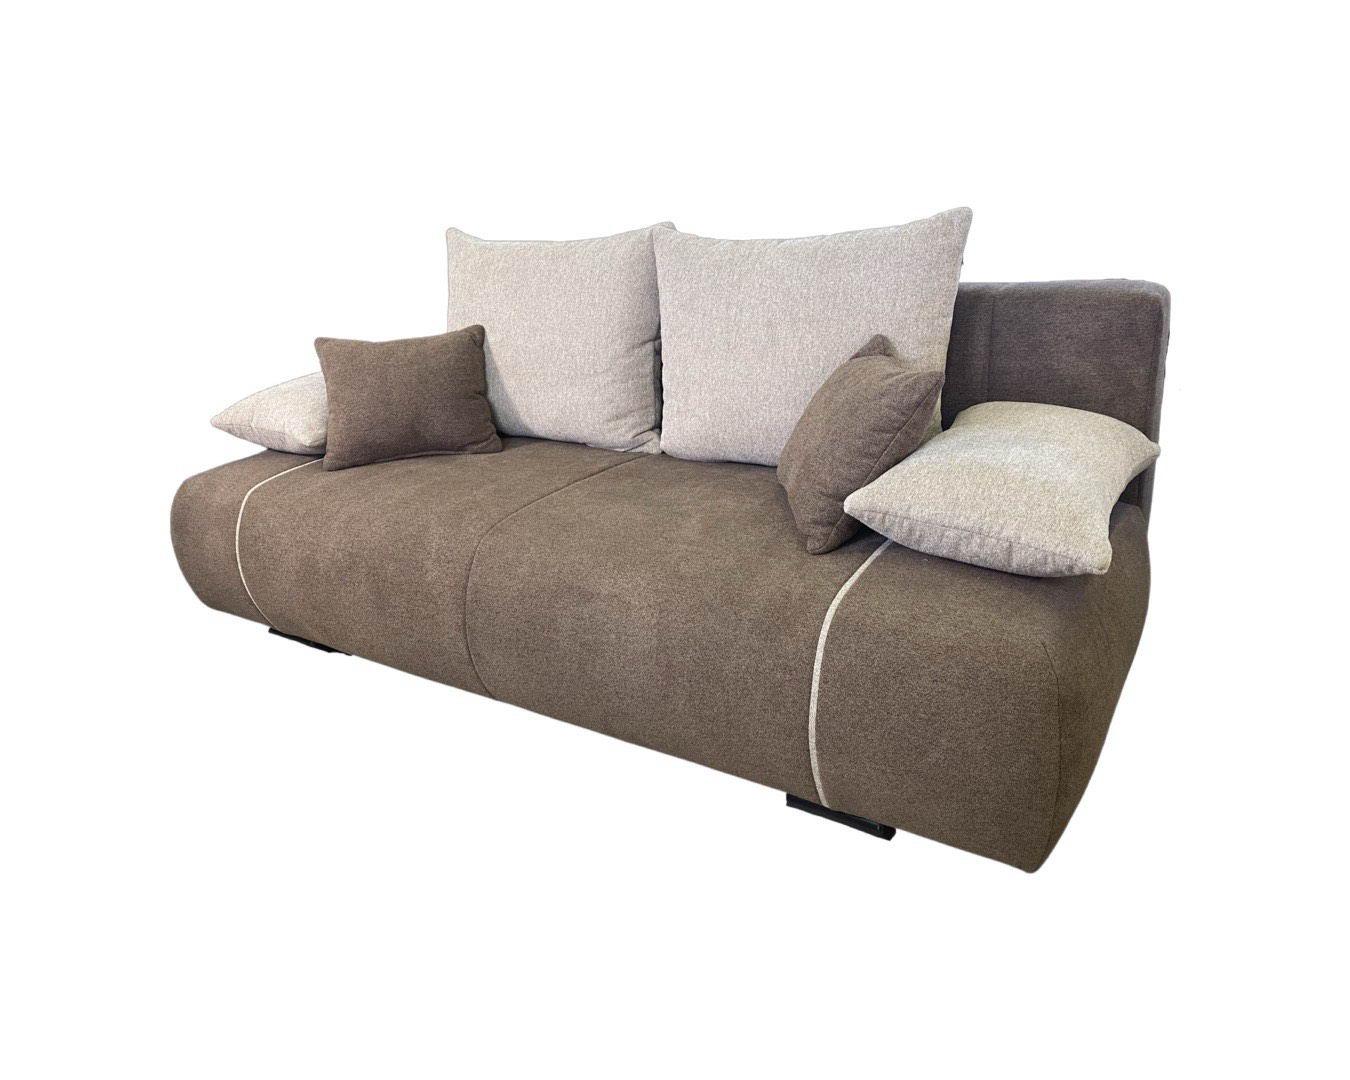 Bonell rugós  kókusz matrac 160x200